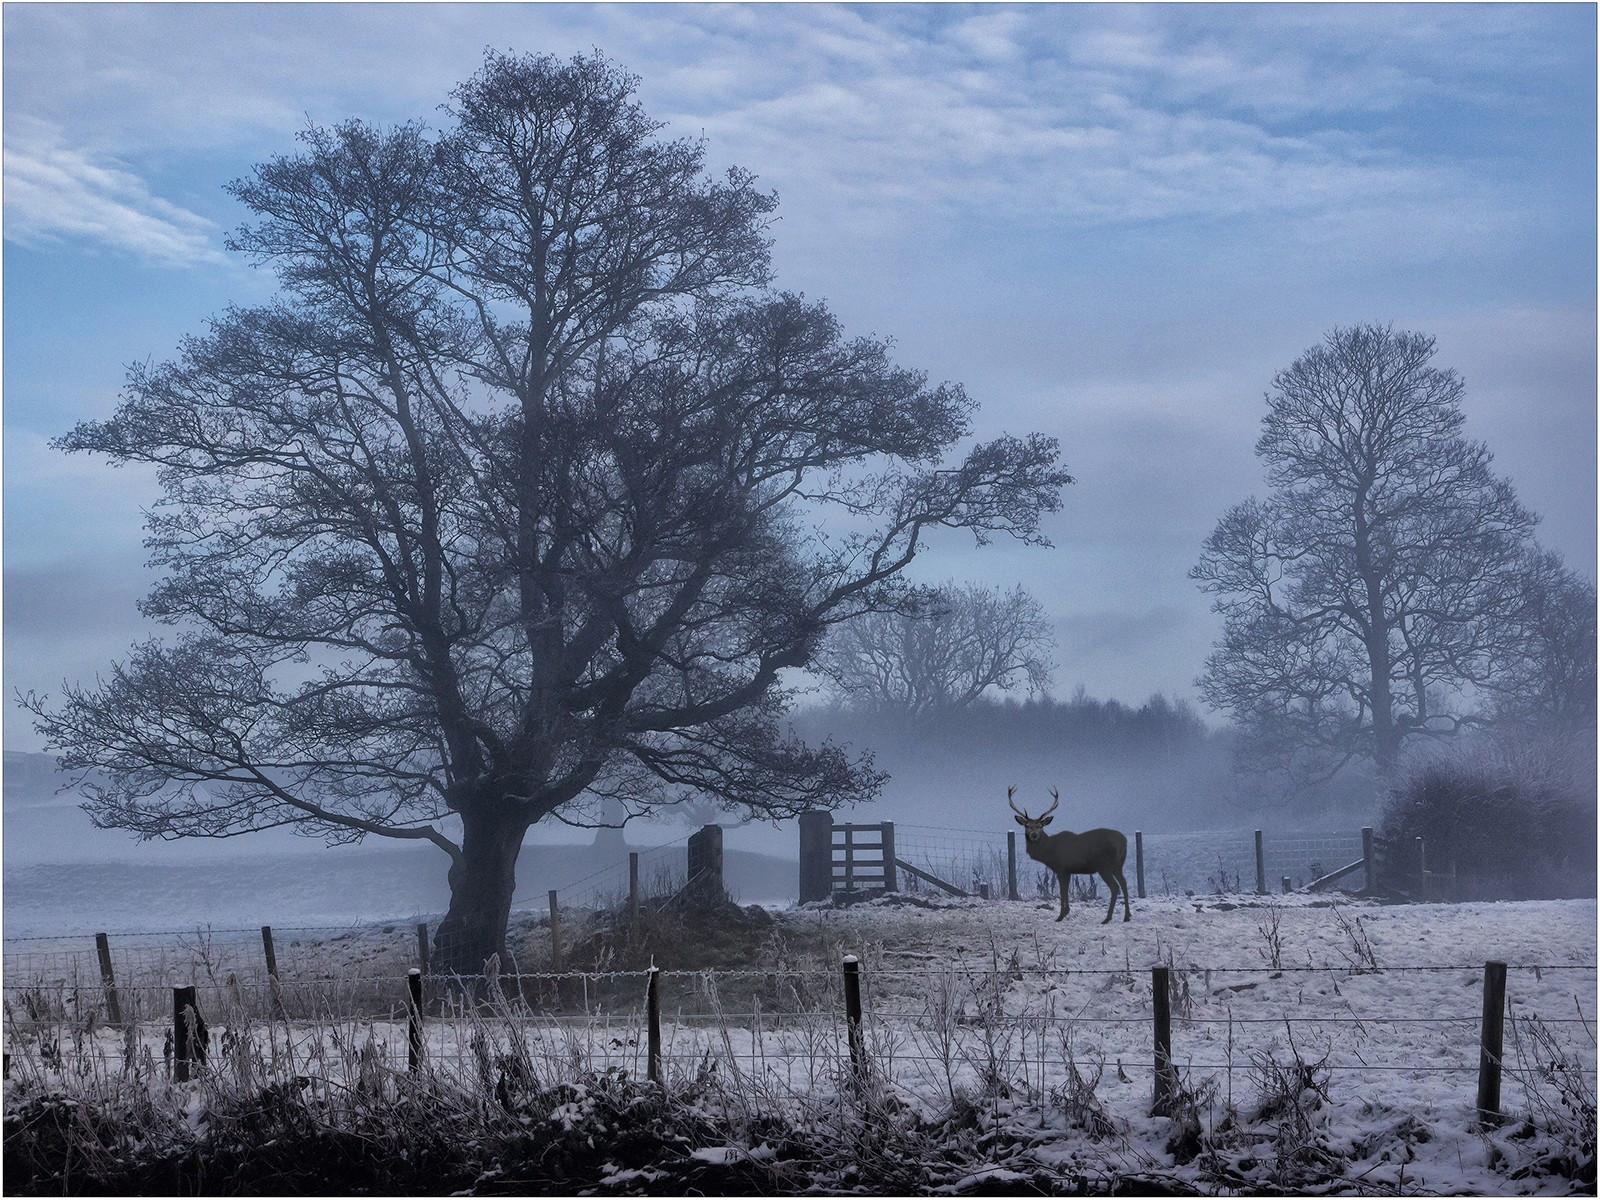 15. Misty Winter's Day